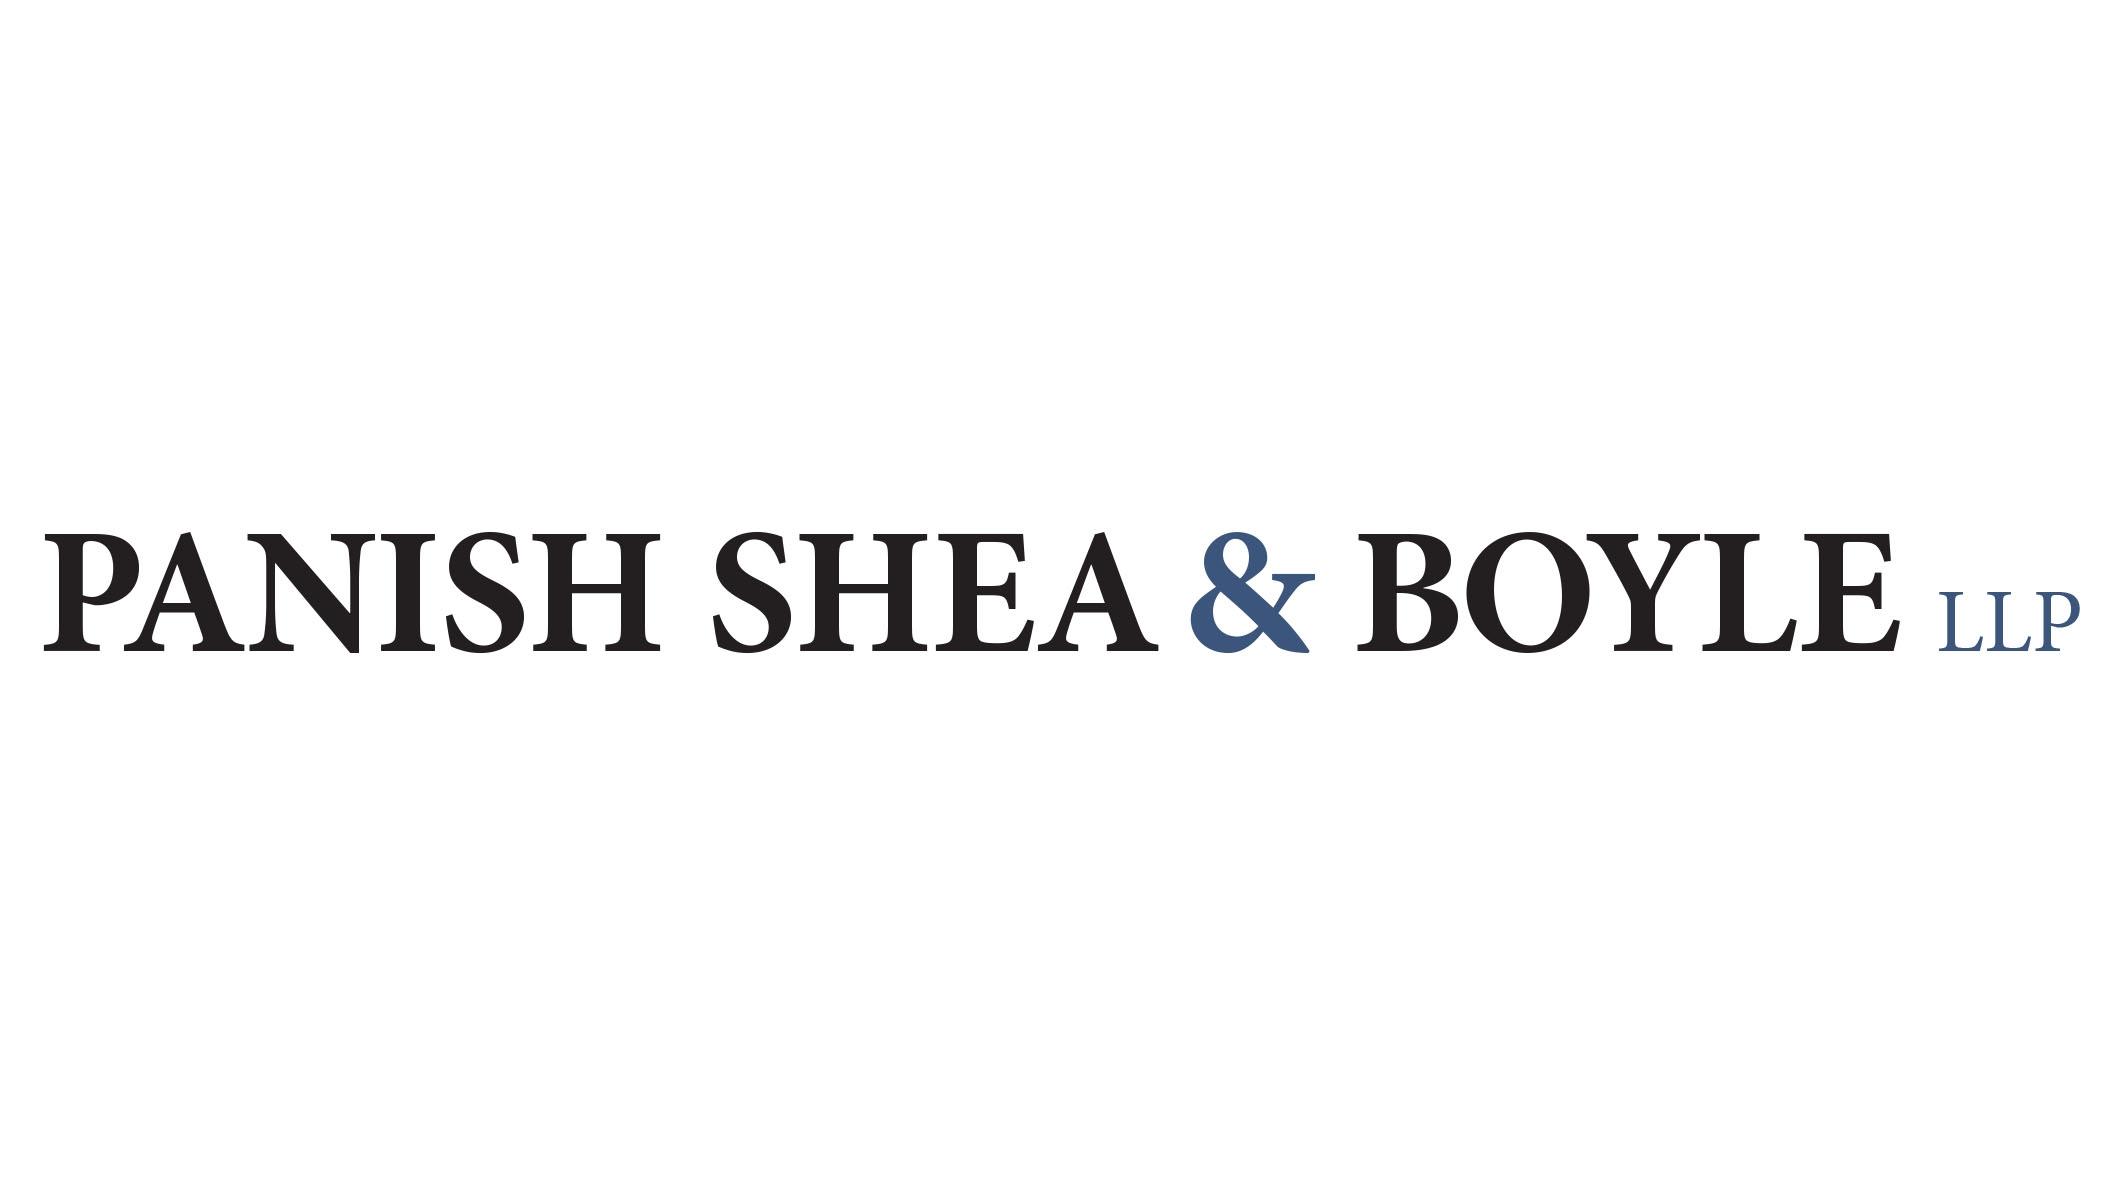 Panish Shea & Boyle